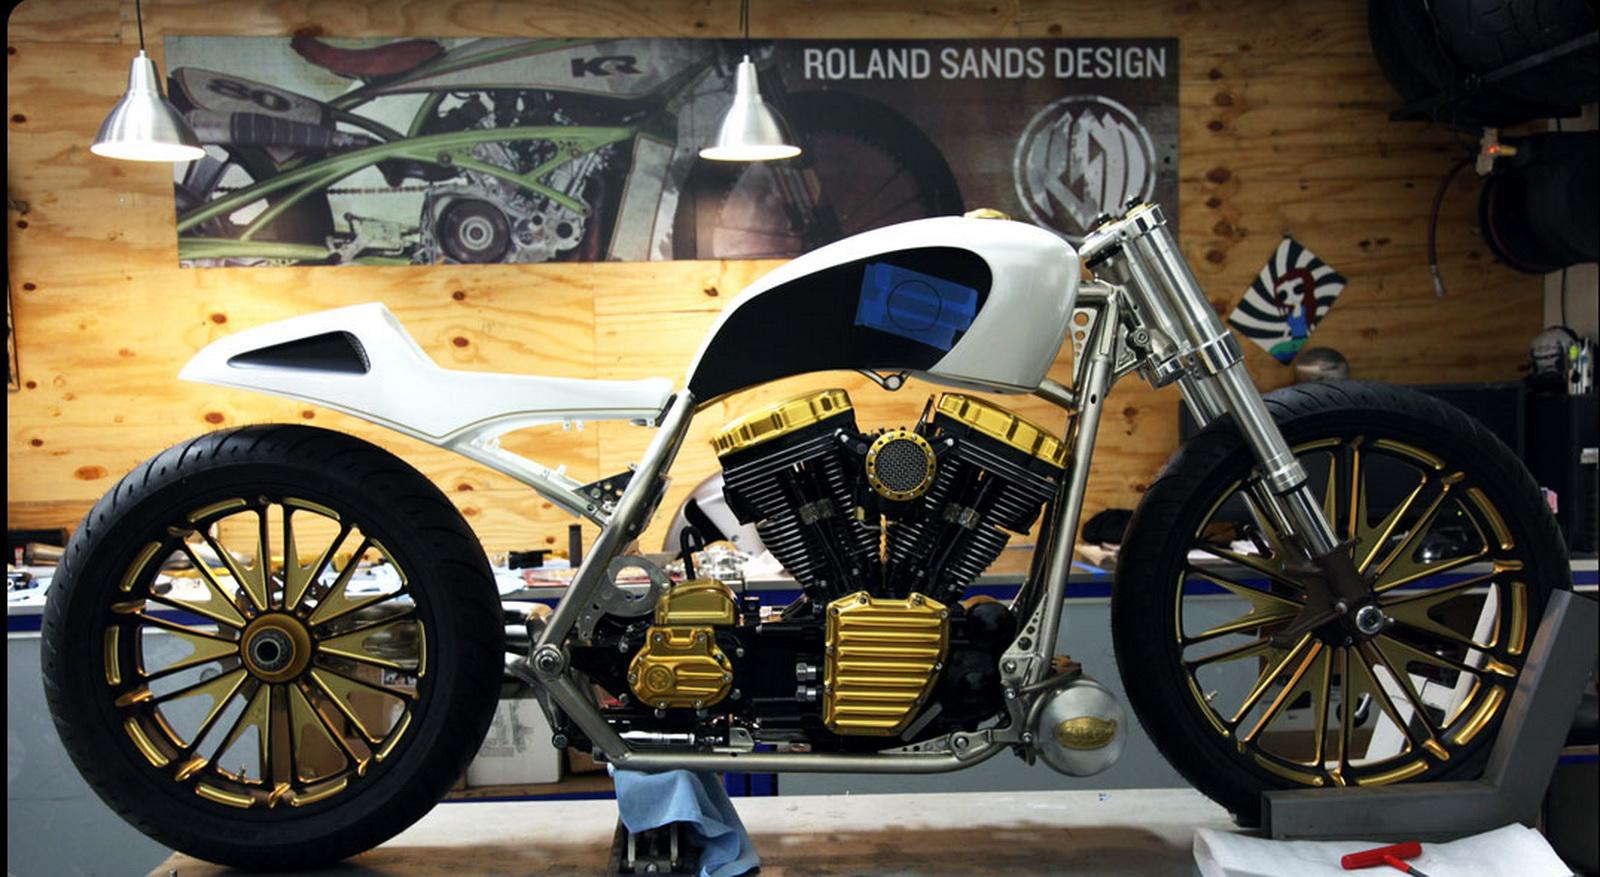 http://3.bp.blogspot.com/-QxIt6SheeDo/TraFjgiBqCI/AAAAAAAAAtg/RS_8msnQliM/s1600/Mickey+Rourke+Bike+Concept+by+RSD+1.jpg